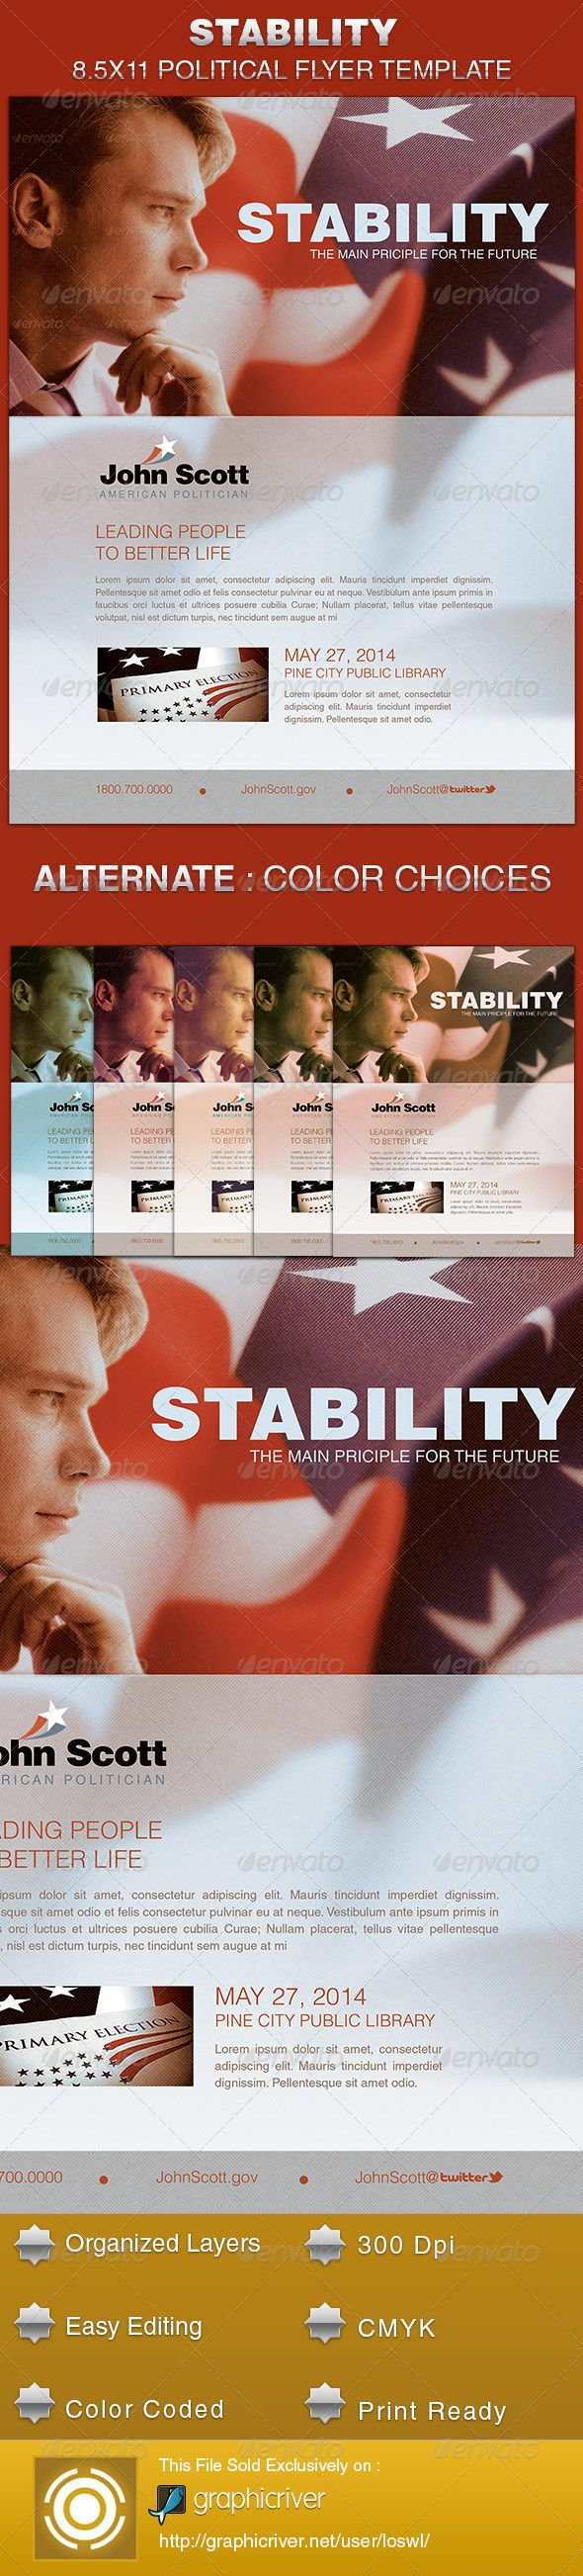 Stability political flyer template flyer template stability and stability political flyer template saigontimesfo